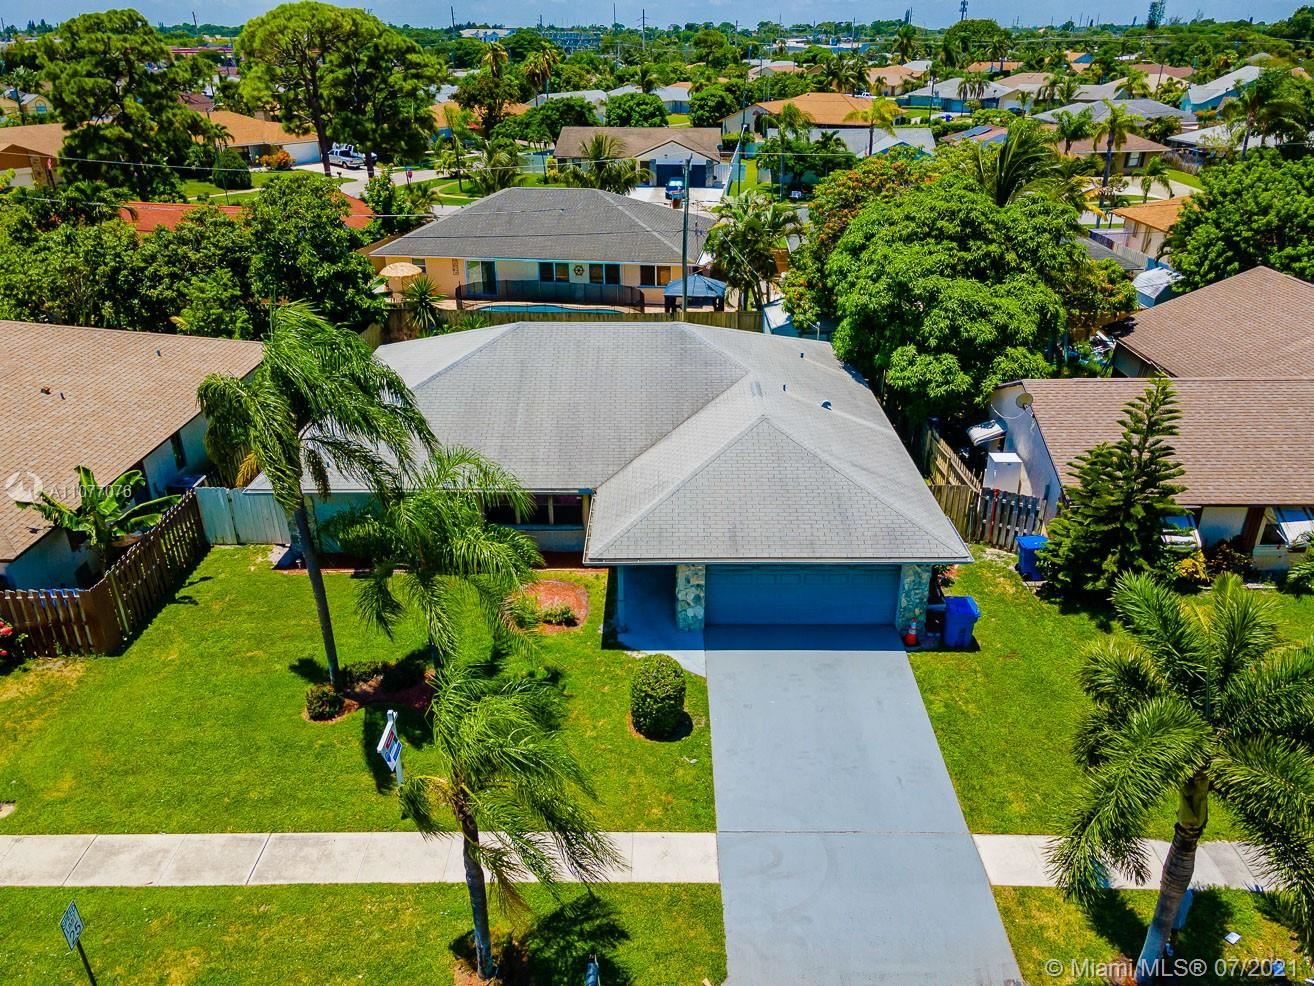 1200 Sea Pines Way, Lantana, FL 33462 - #: A11077076